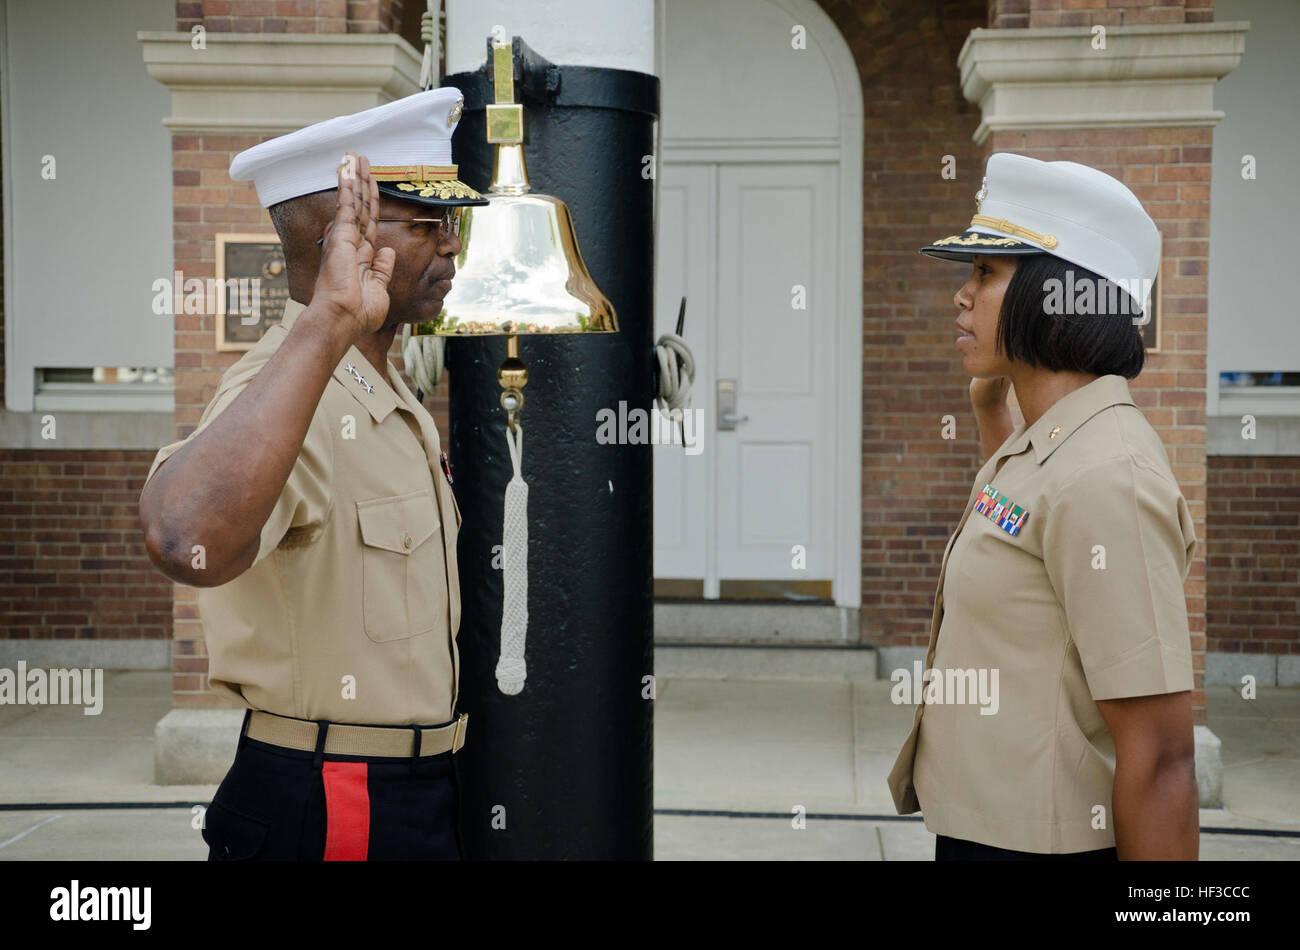 Beste Marine Corps Rahmen Galerie - Benutzerdefinierte Bilderrahmen ...